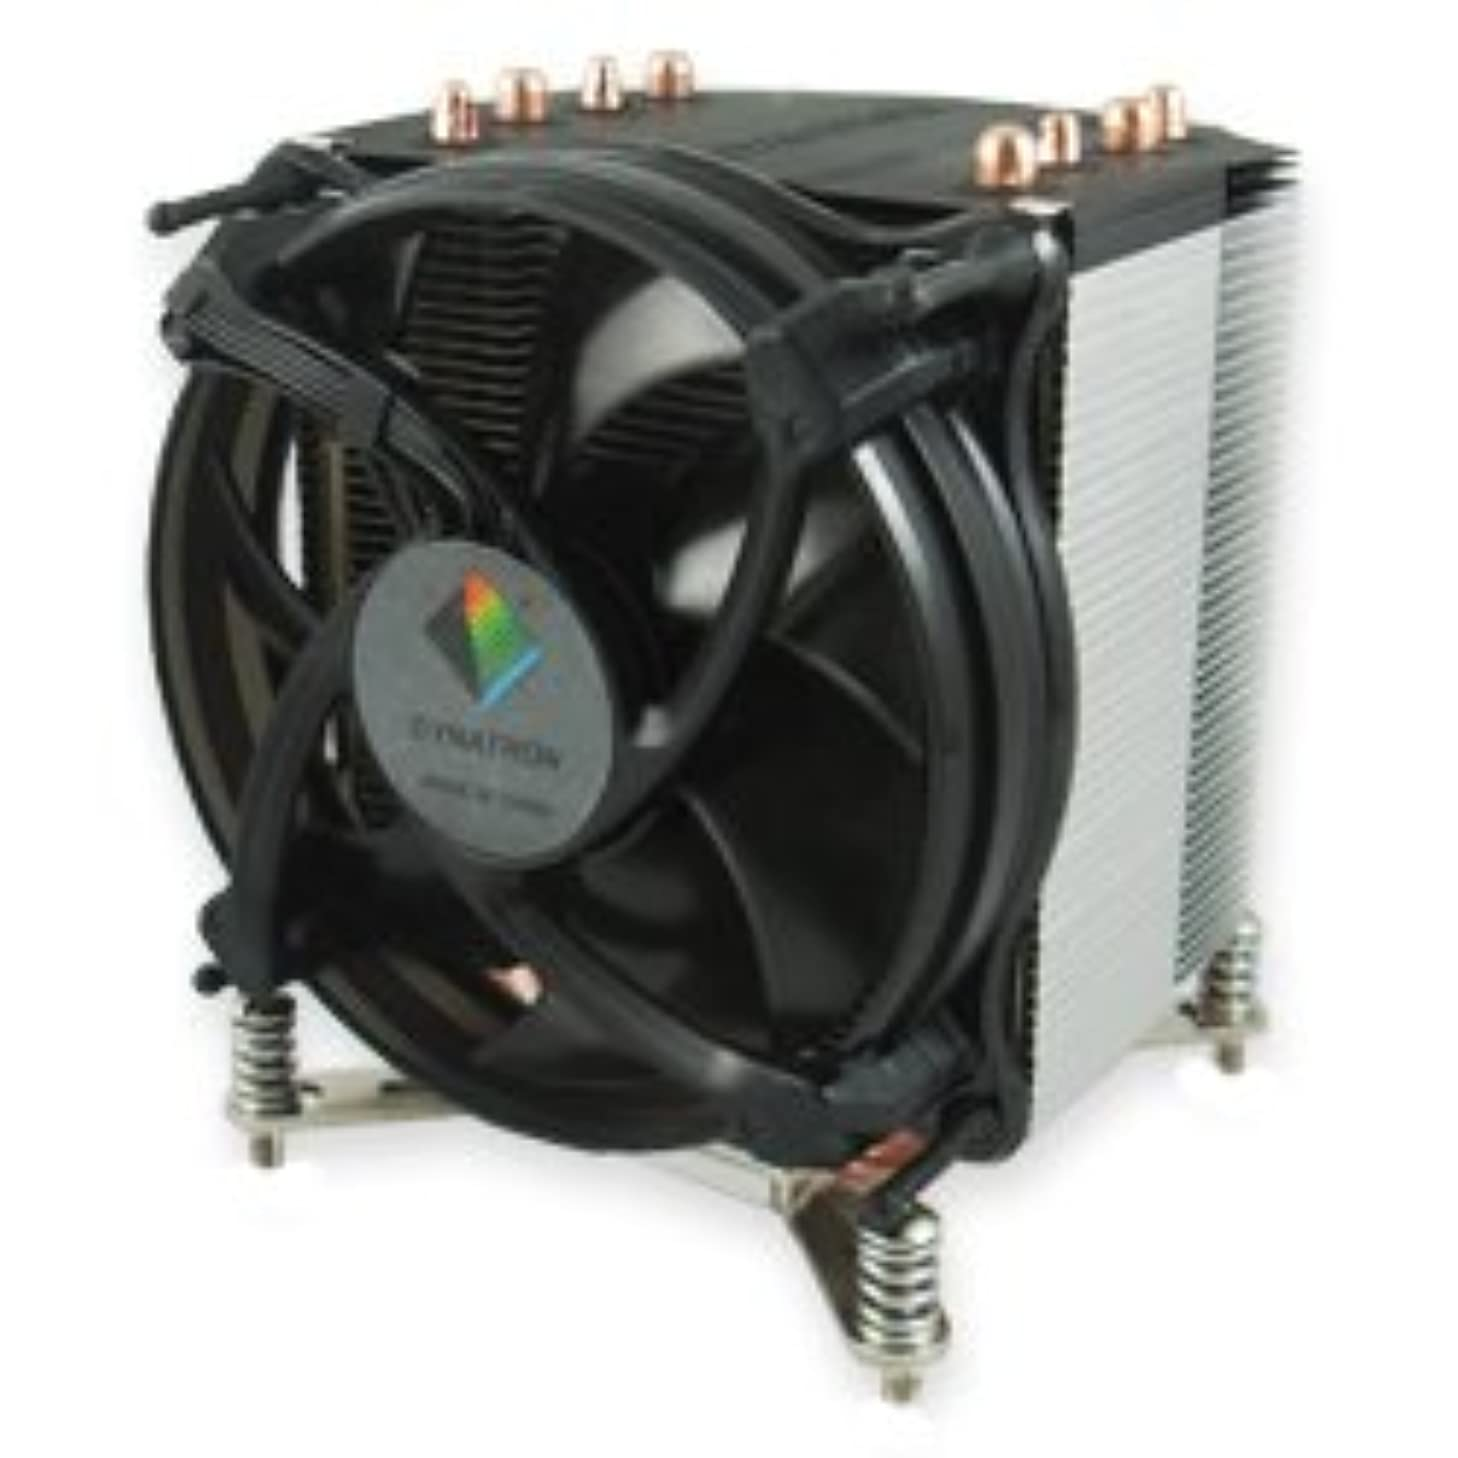 Dynatron R17 Intel socket 2011 3U/Workstation Active Solution 2 Ball Bearing CPU Cooler